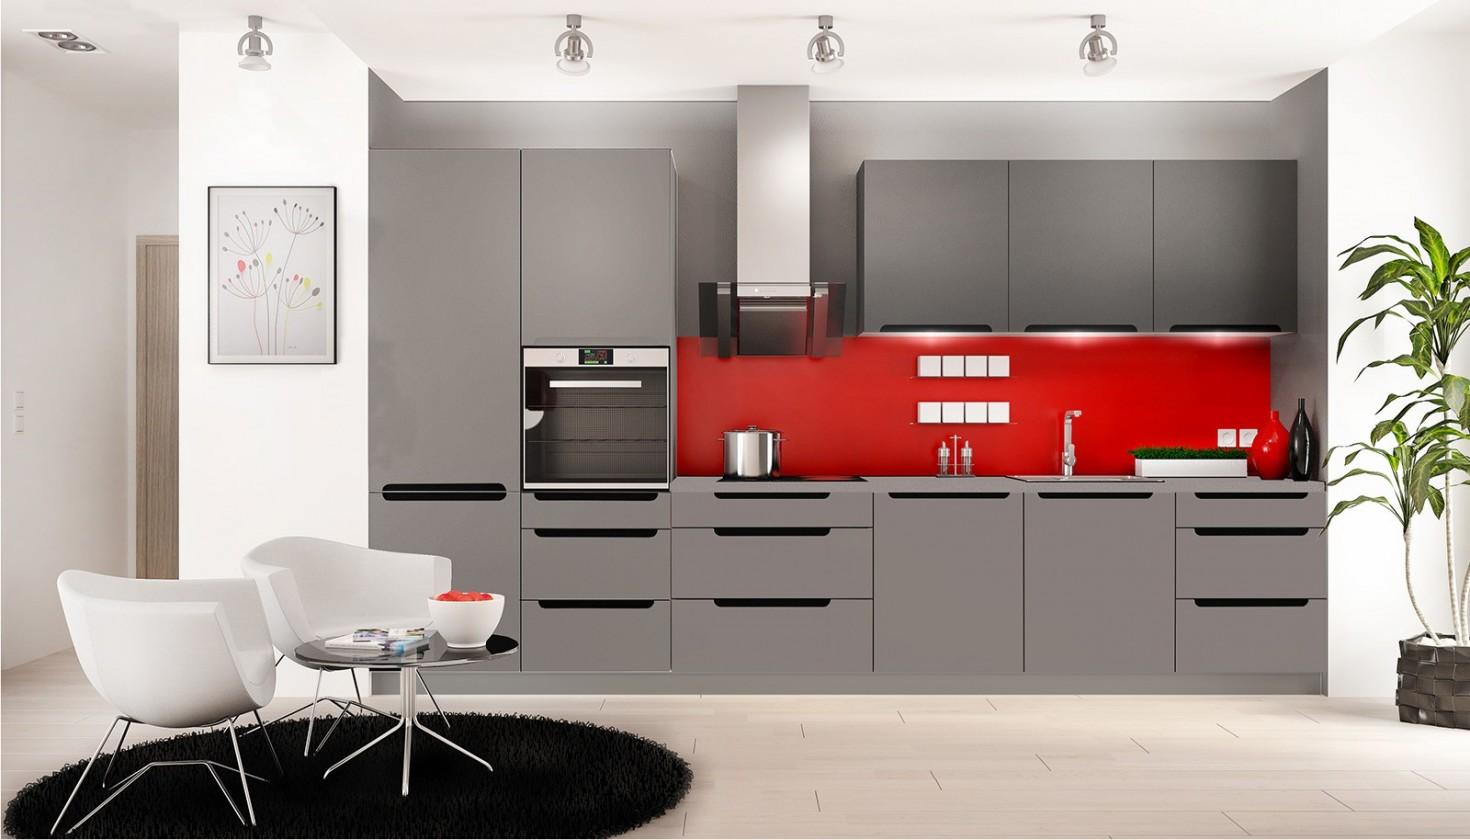 Rovná Goya - Kuchyňský blok 330 cm (šedá mat, PD porfido grafit)